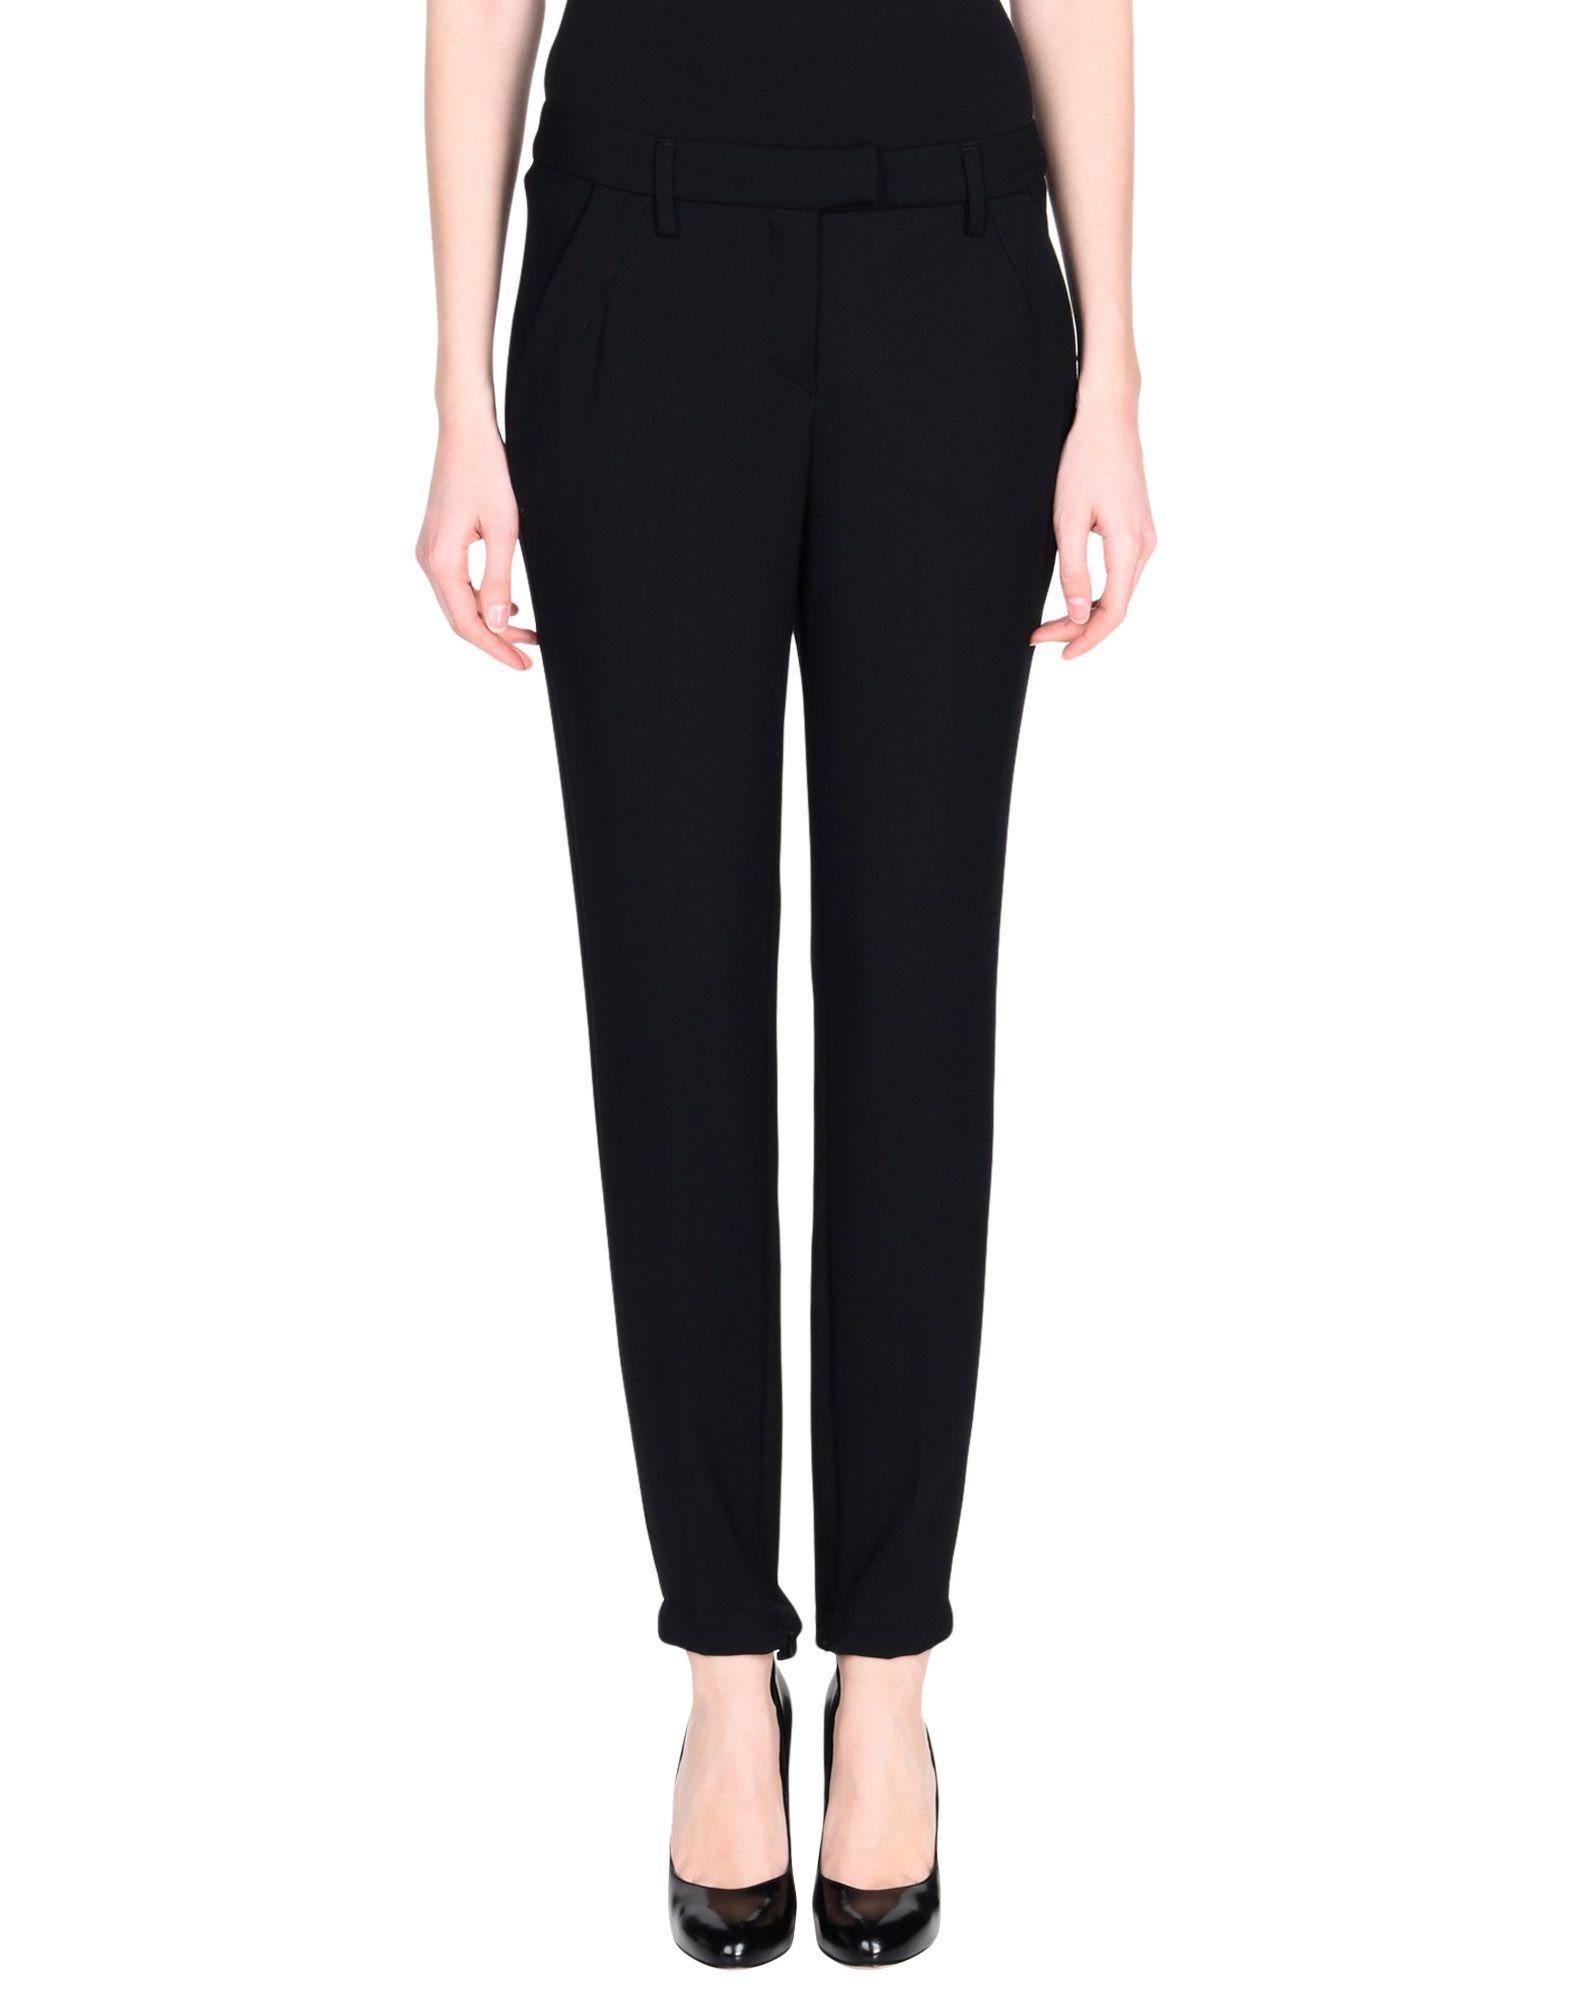 Pantalone Dondup Donna - Acquista online su geKvdfO6